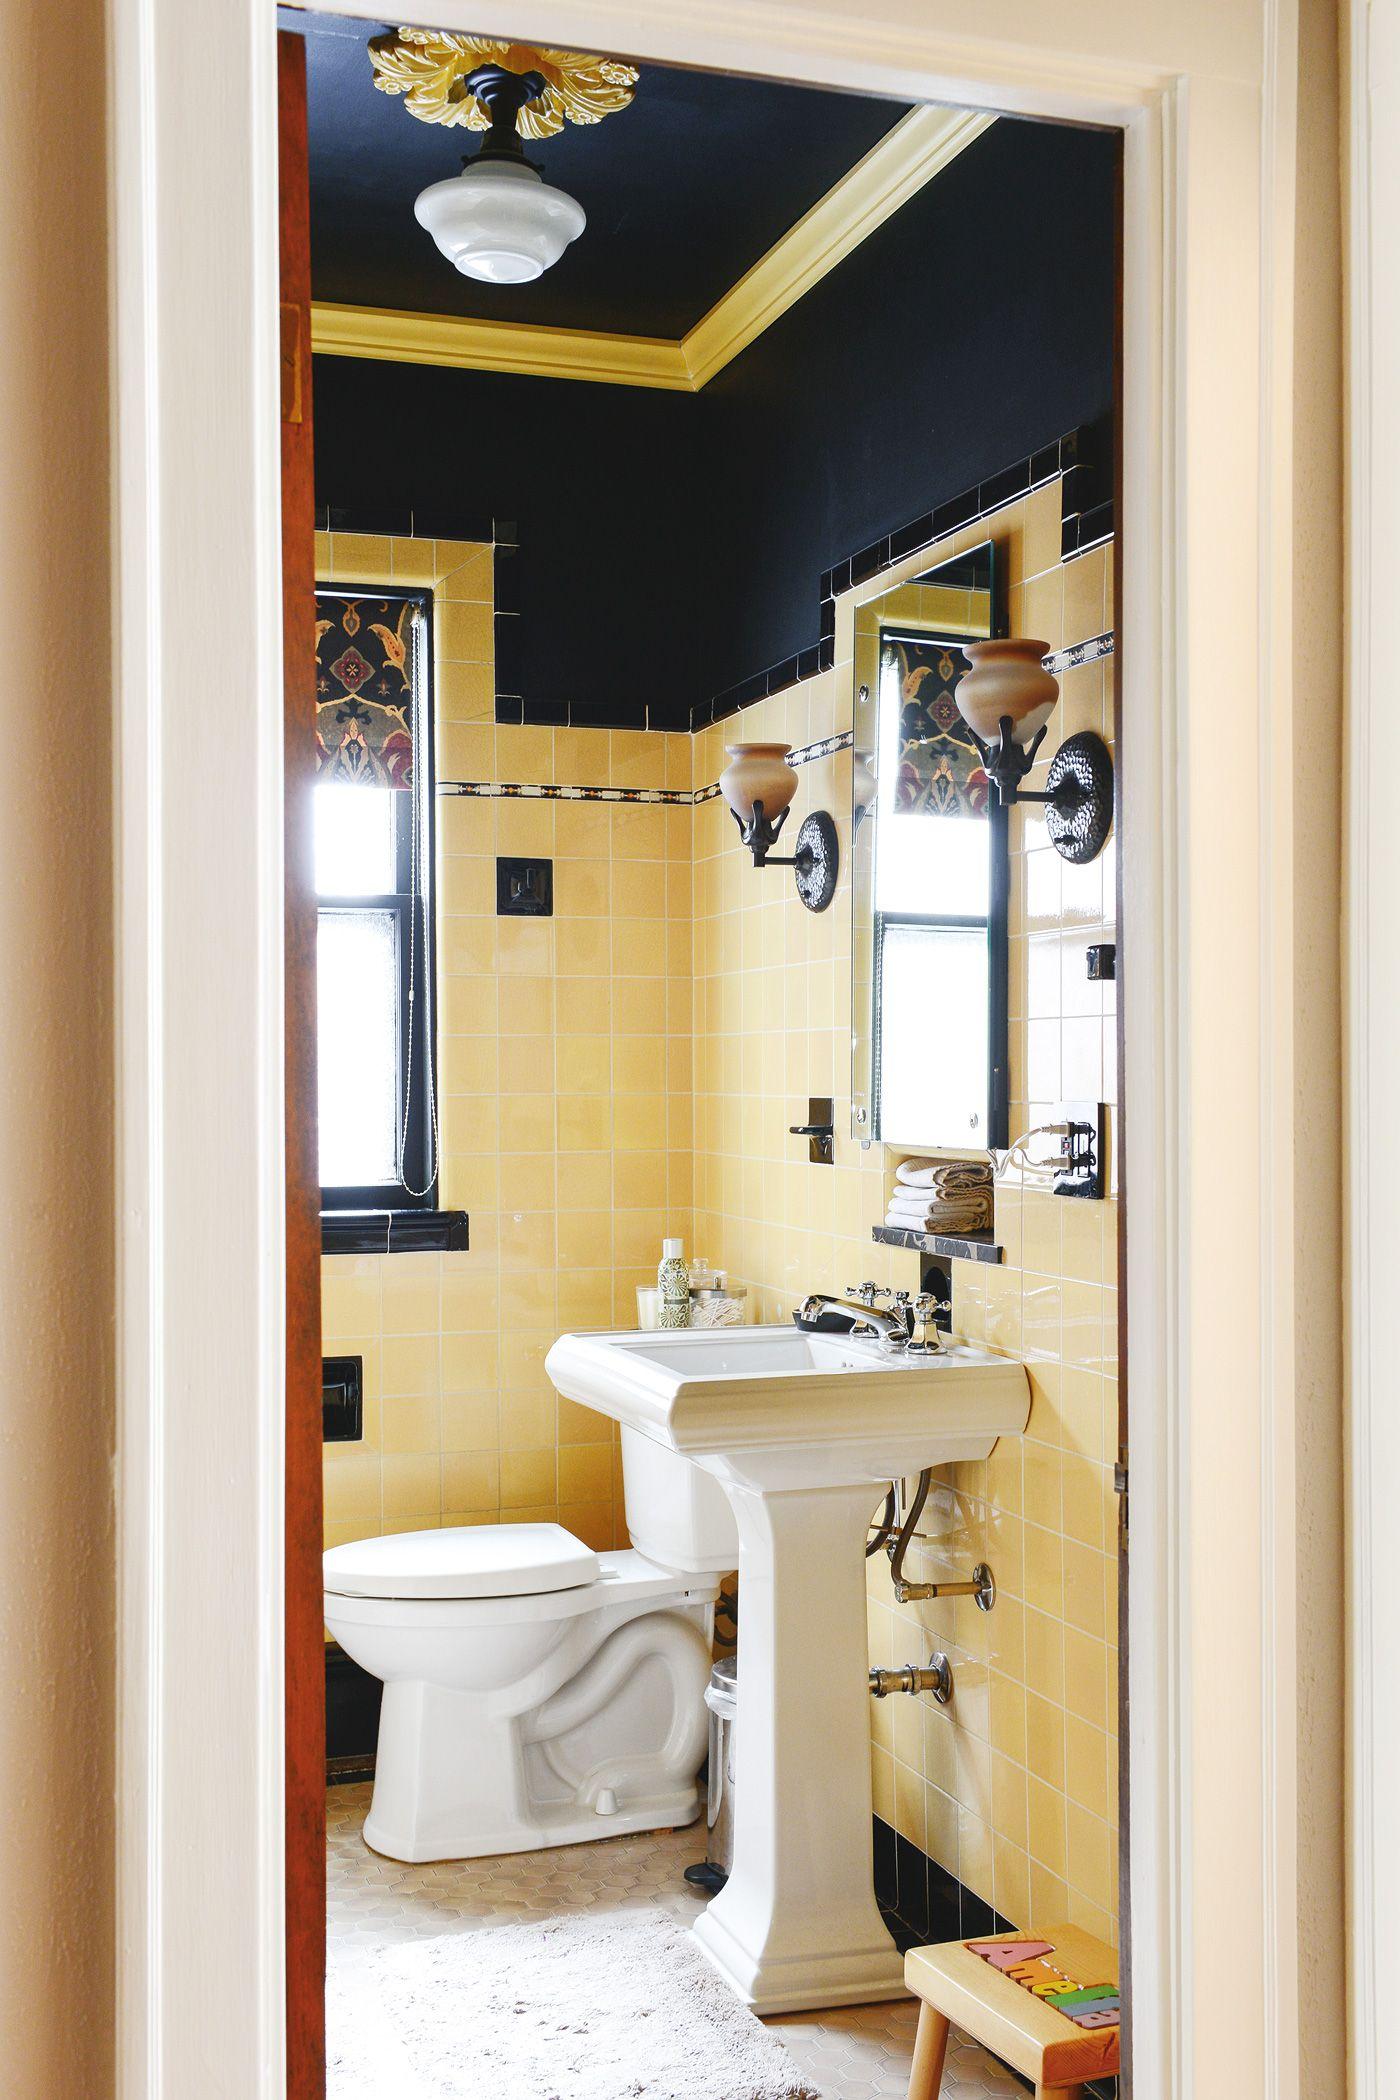 How To Refresh A Vintage Bathroom Keep The Charm I Of Ii